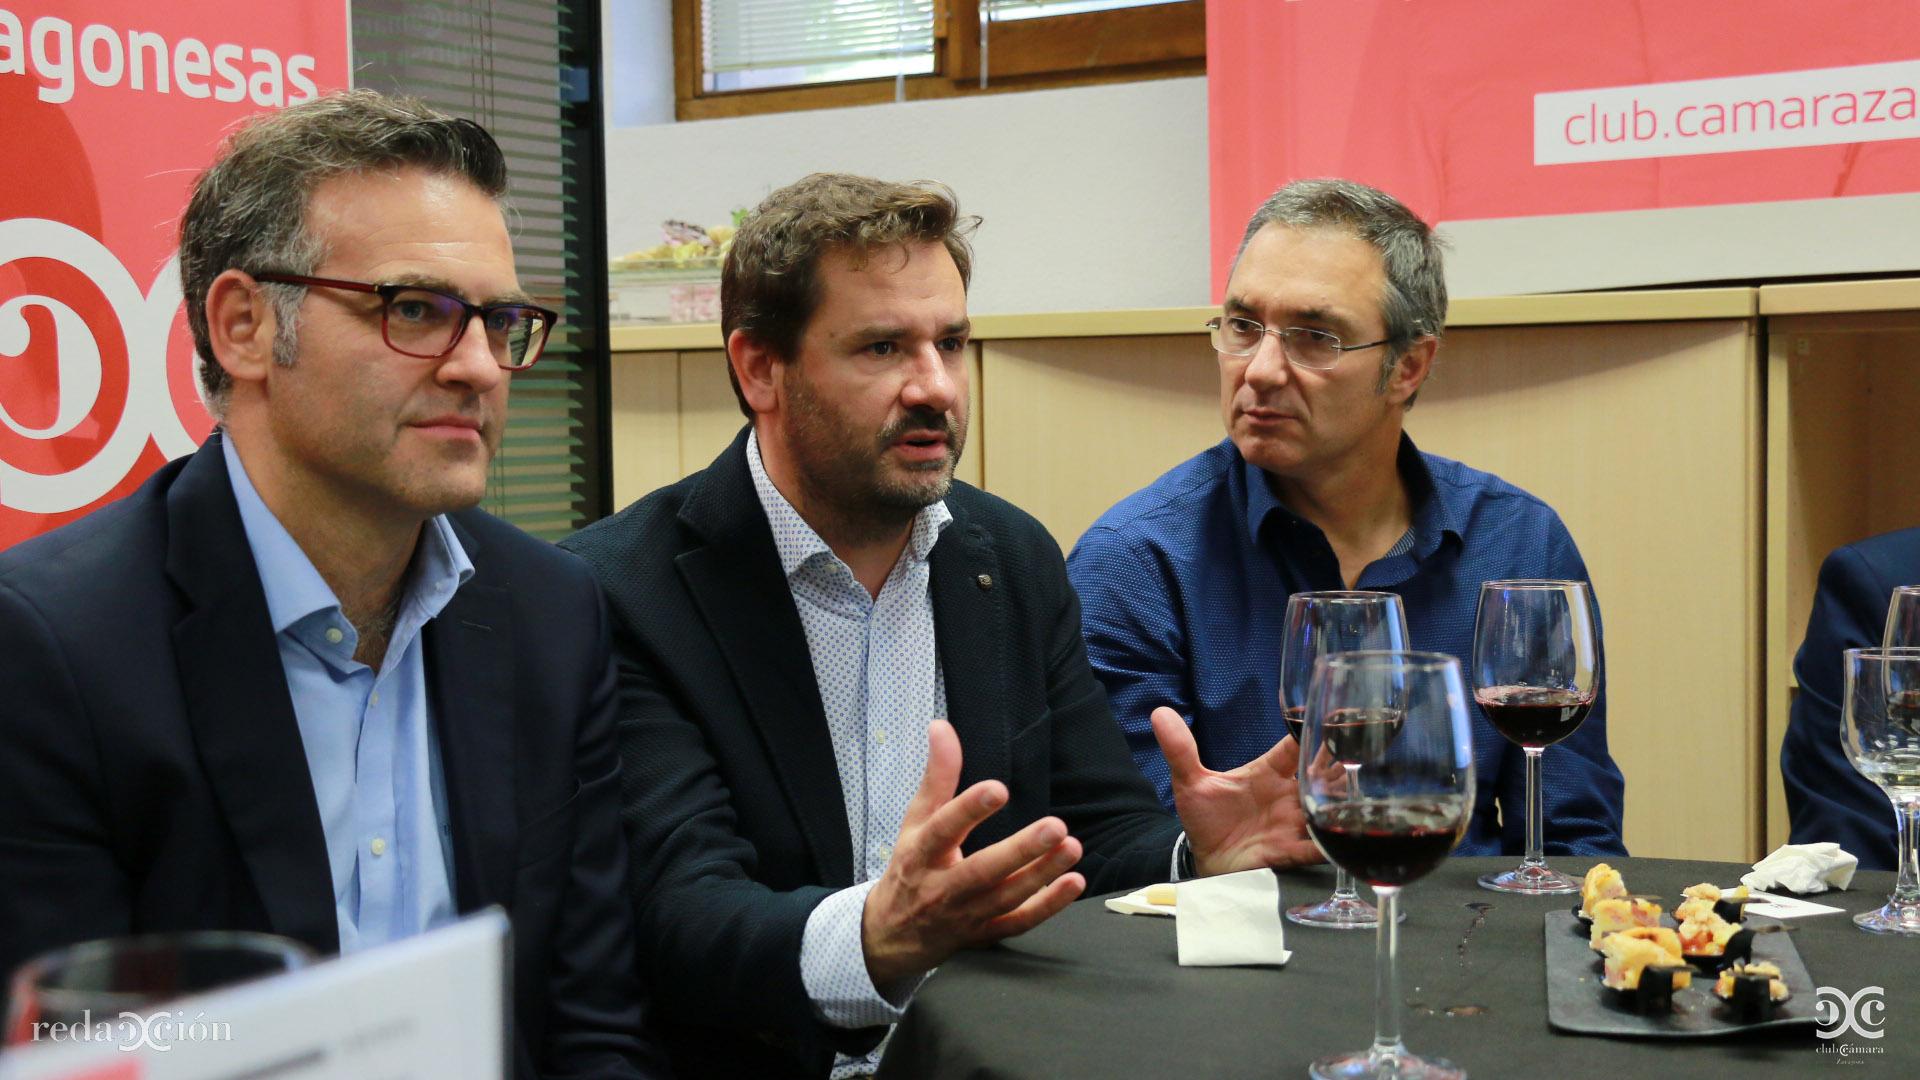 Javier Andonegui, Mariano Espallargas, Guilermo Gistau